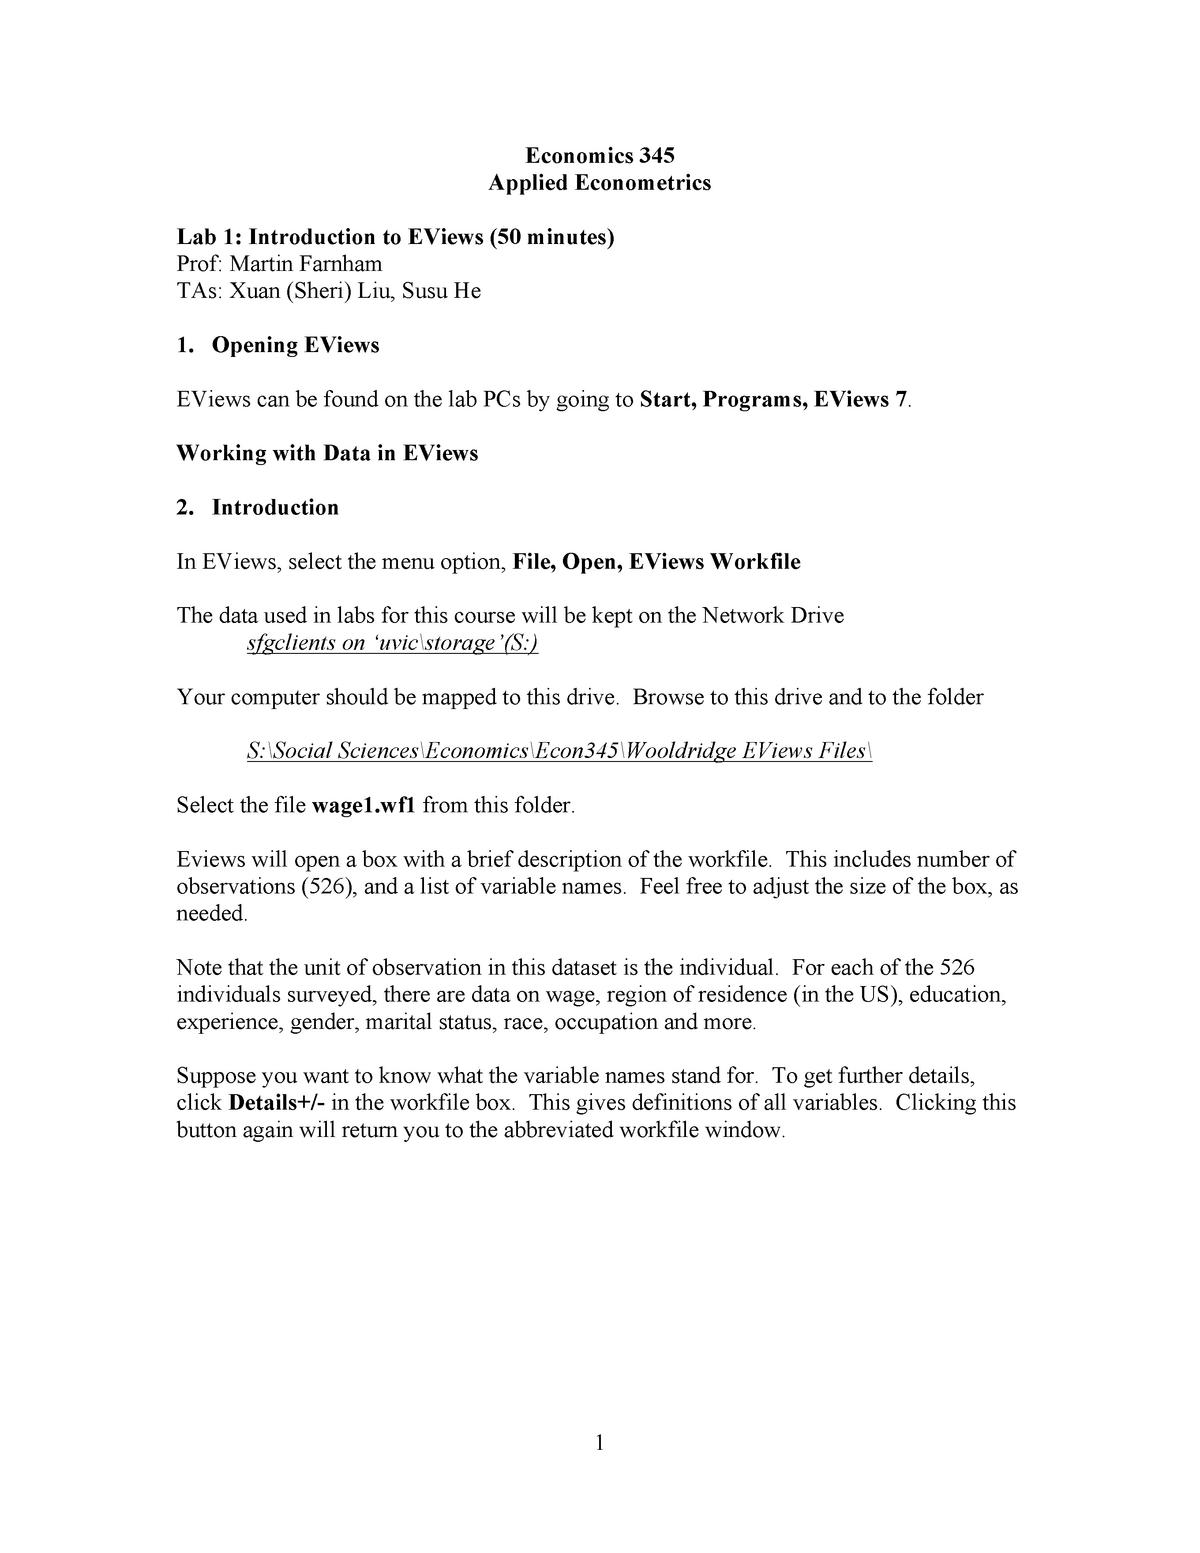 Applied Econometrics - Assignments - lab1 econ345 - Econ345